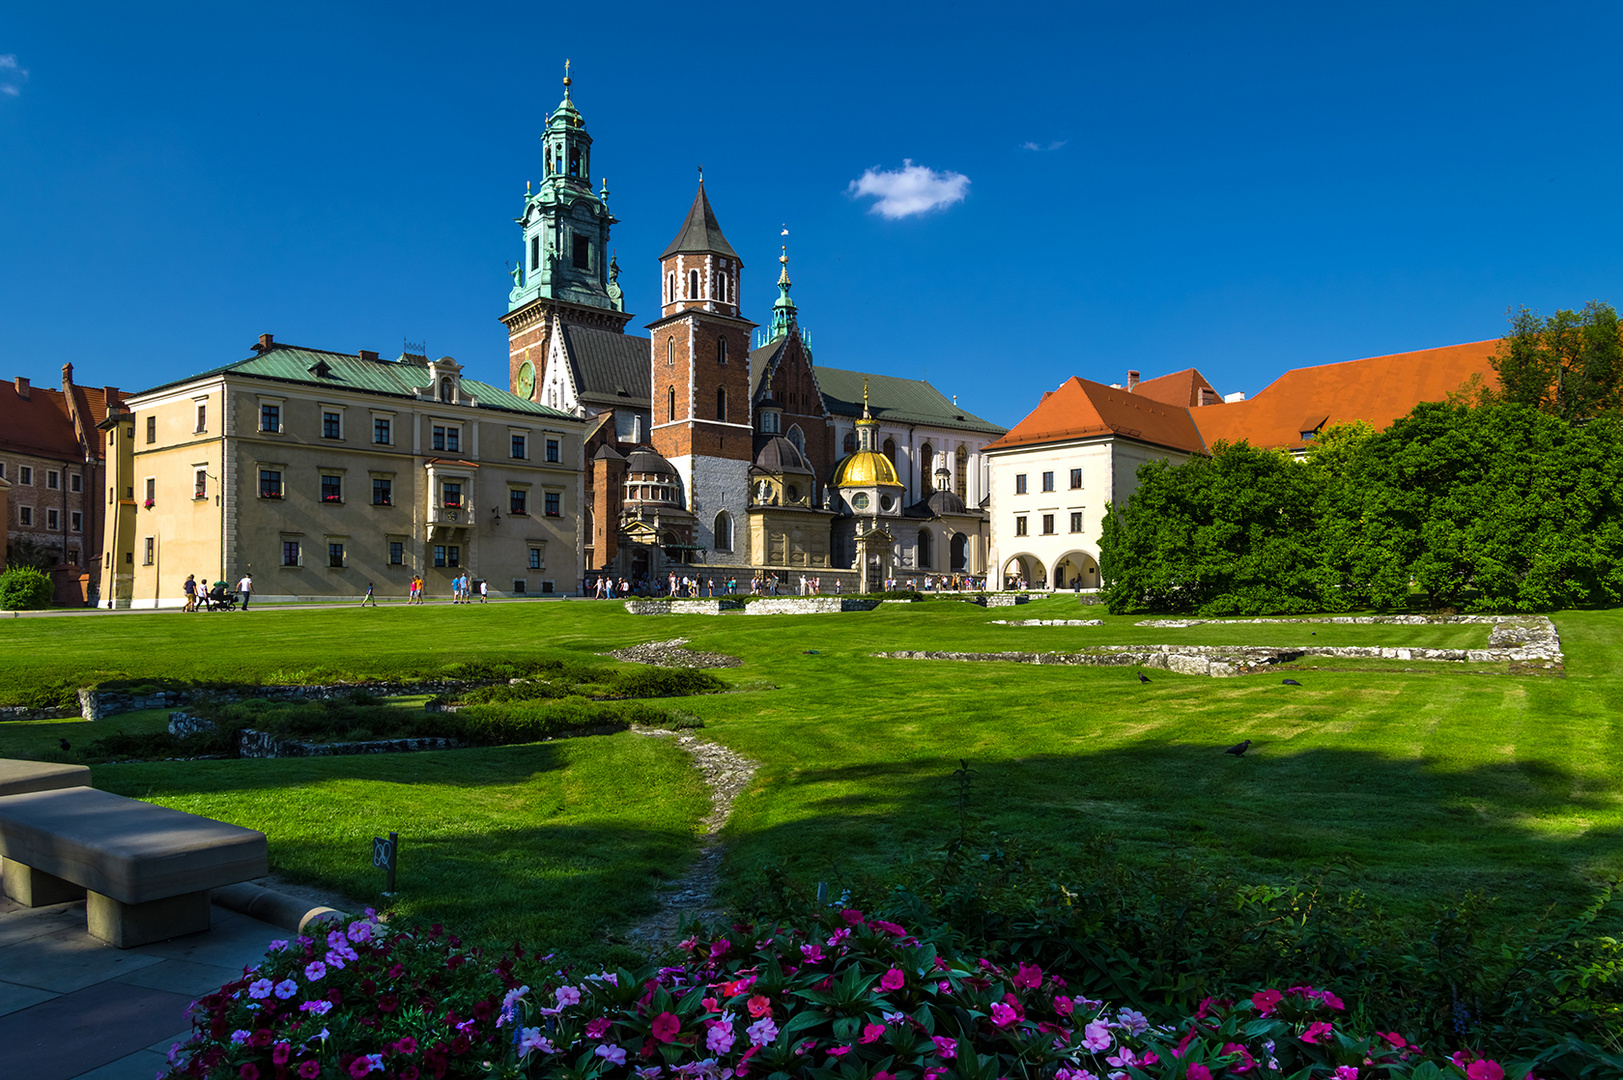 Burg Wawel, Innenhof mit Wawel-Kathedrale